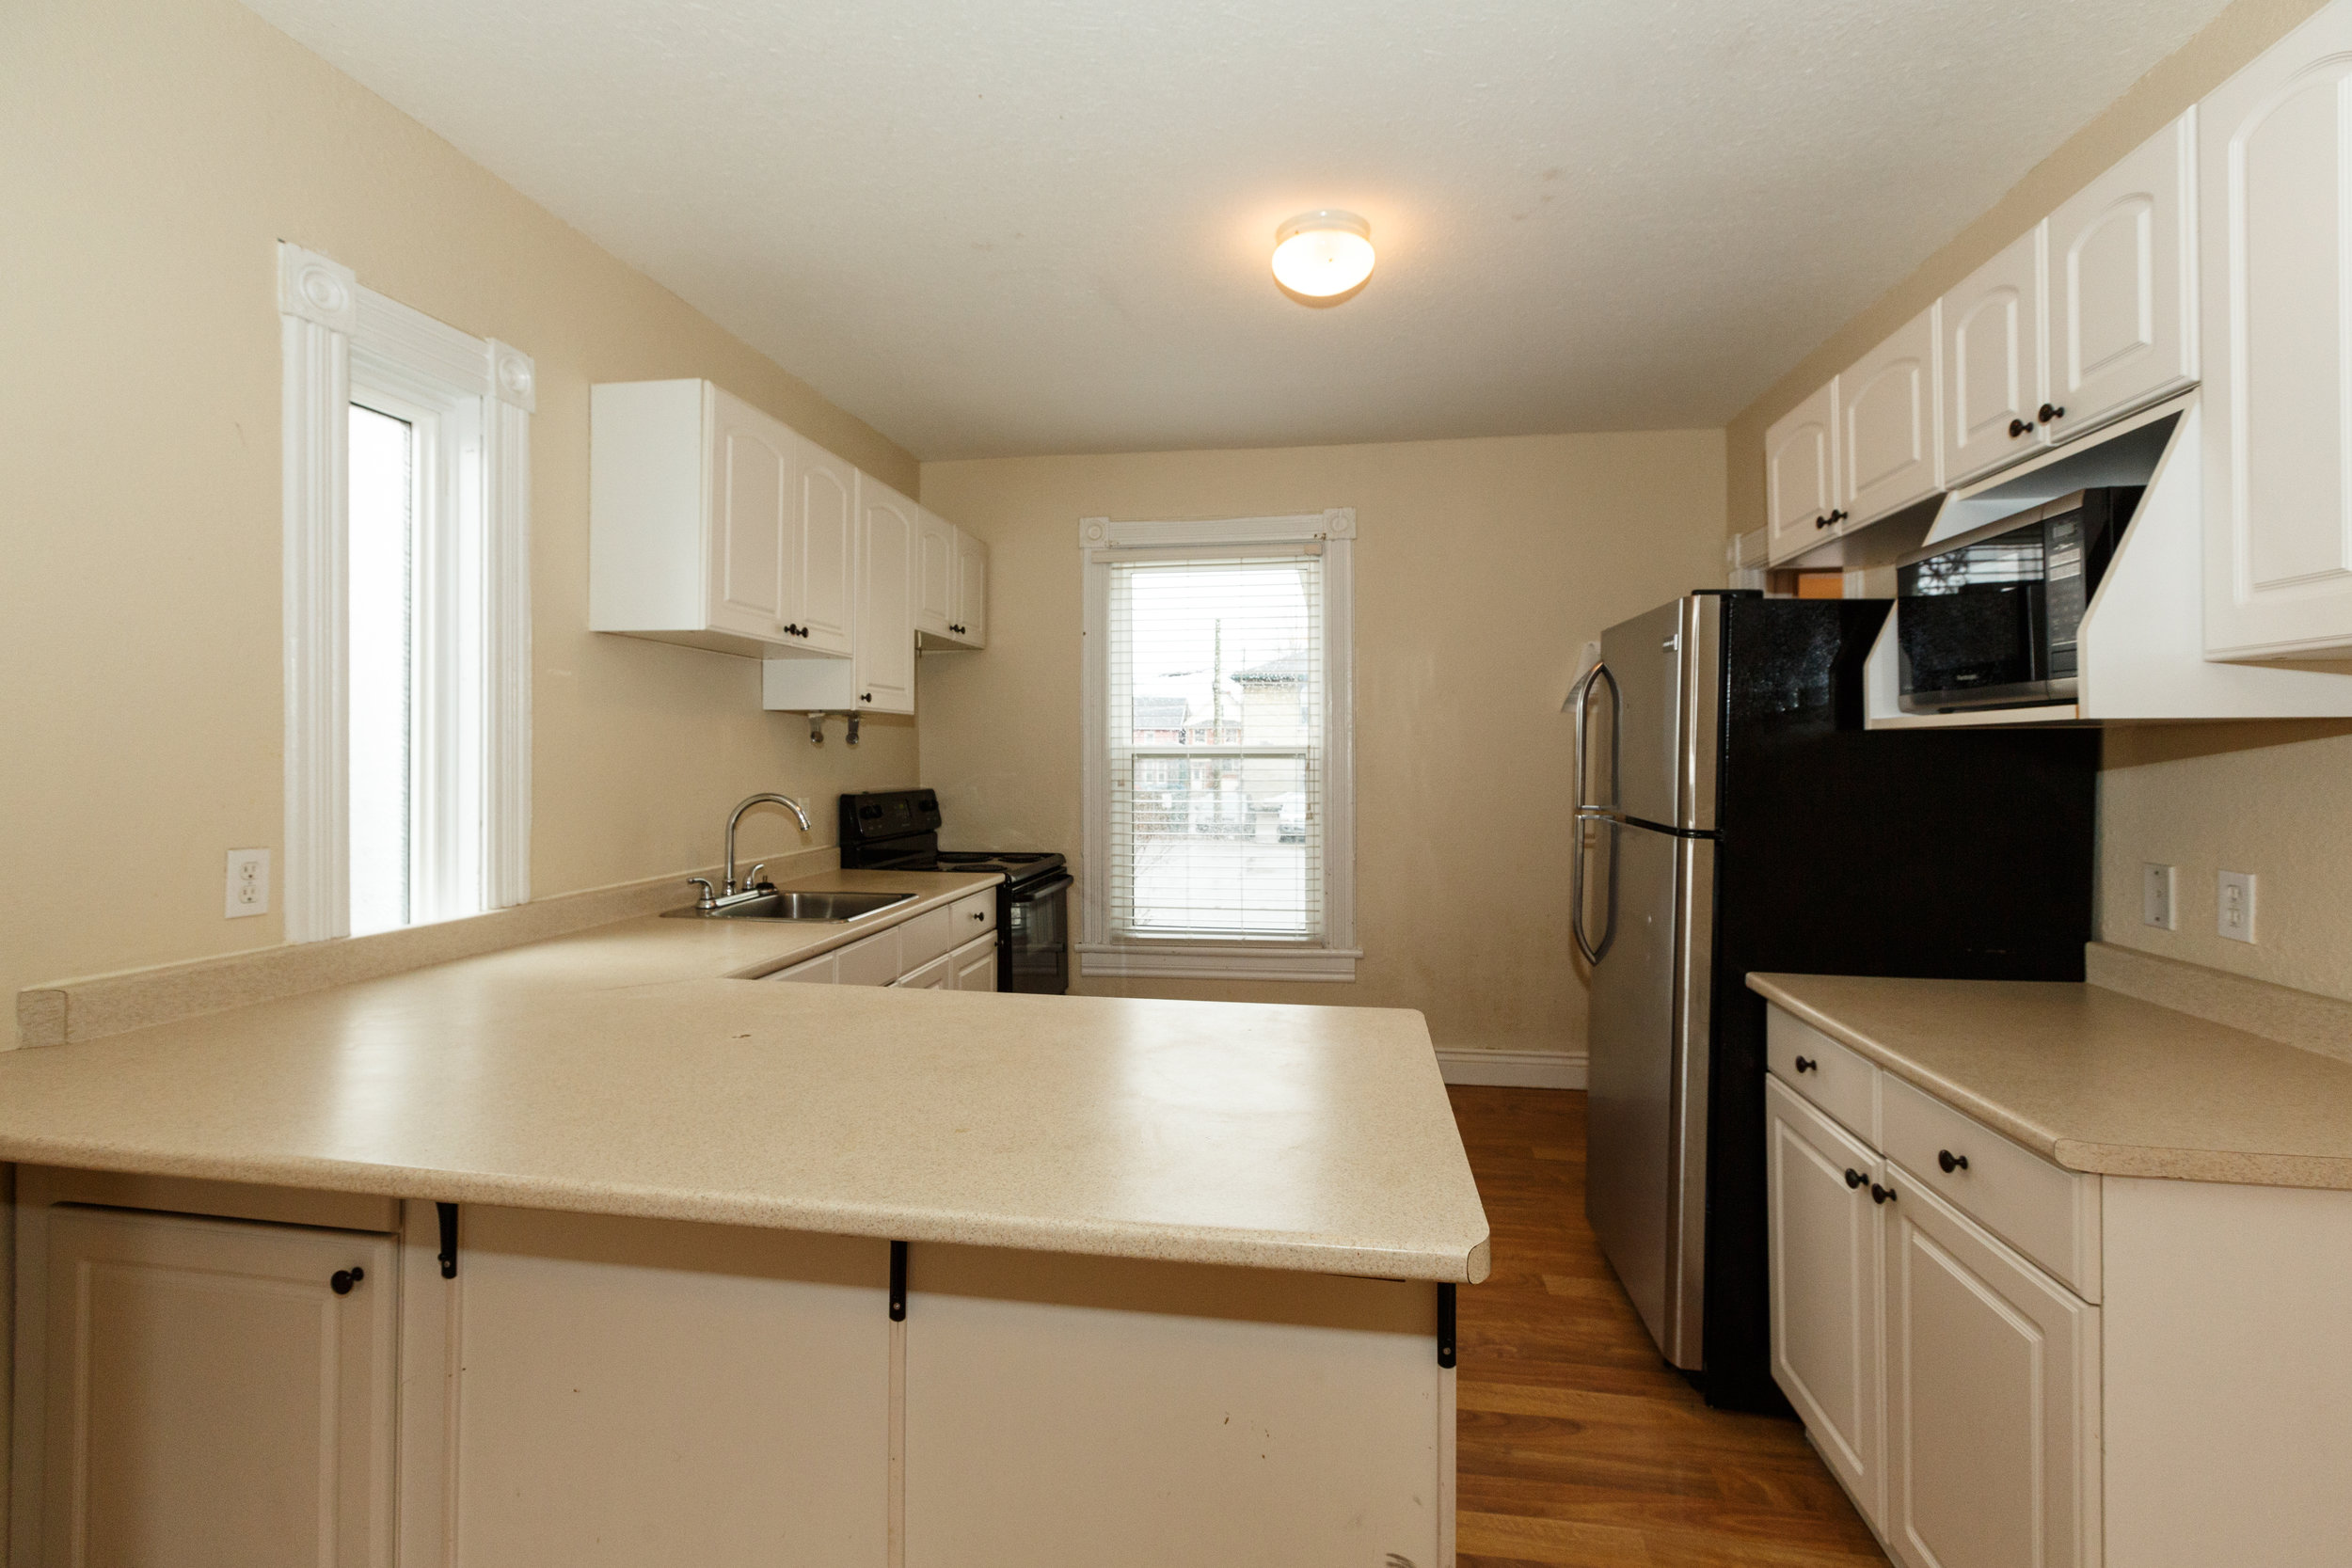 332 Brock St. _u007c_ Kitchen Photo, Full Appliances, Dishwasher, Fridge, Microwave, Stove.jpg